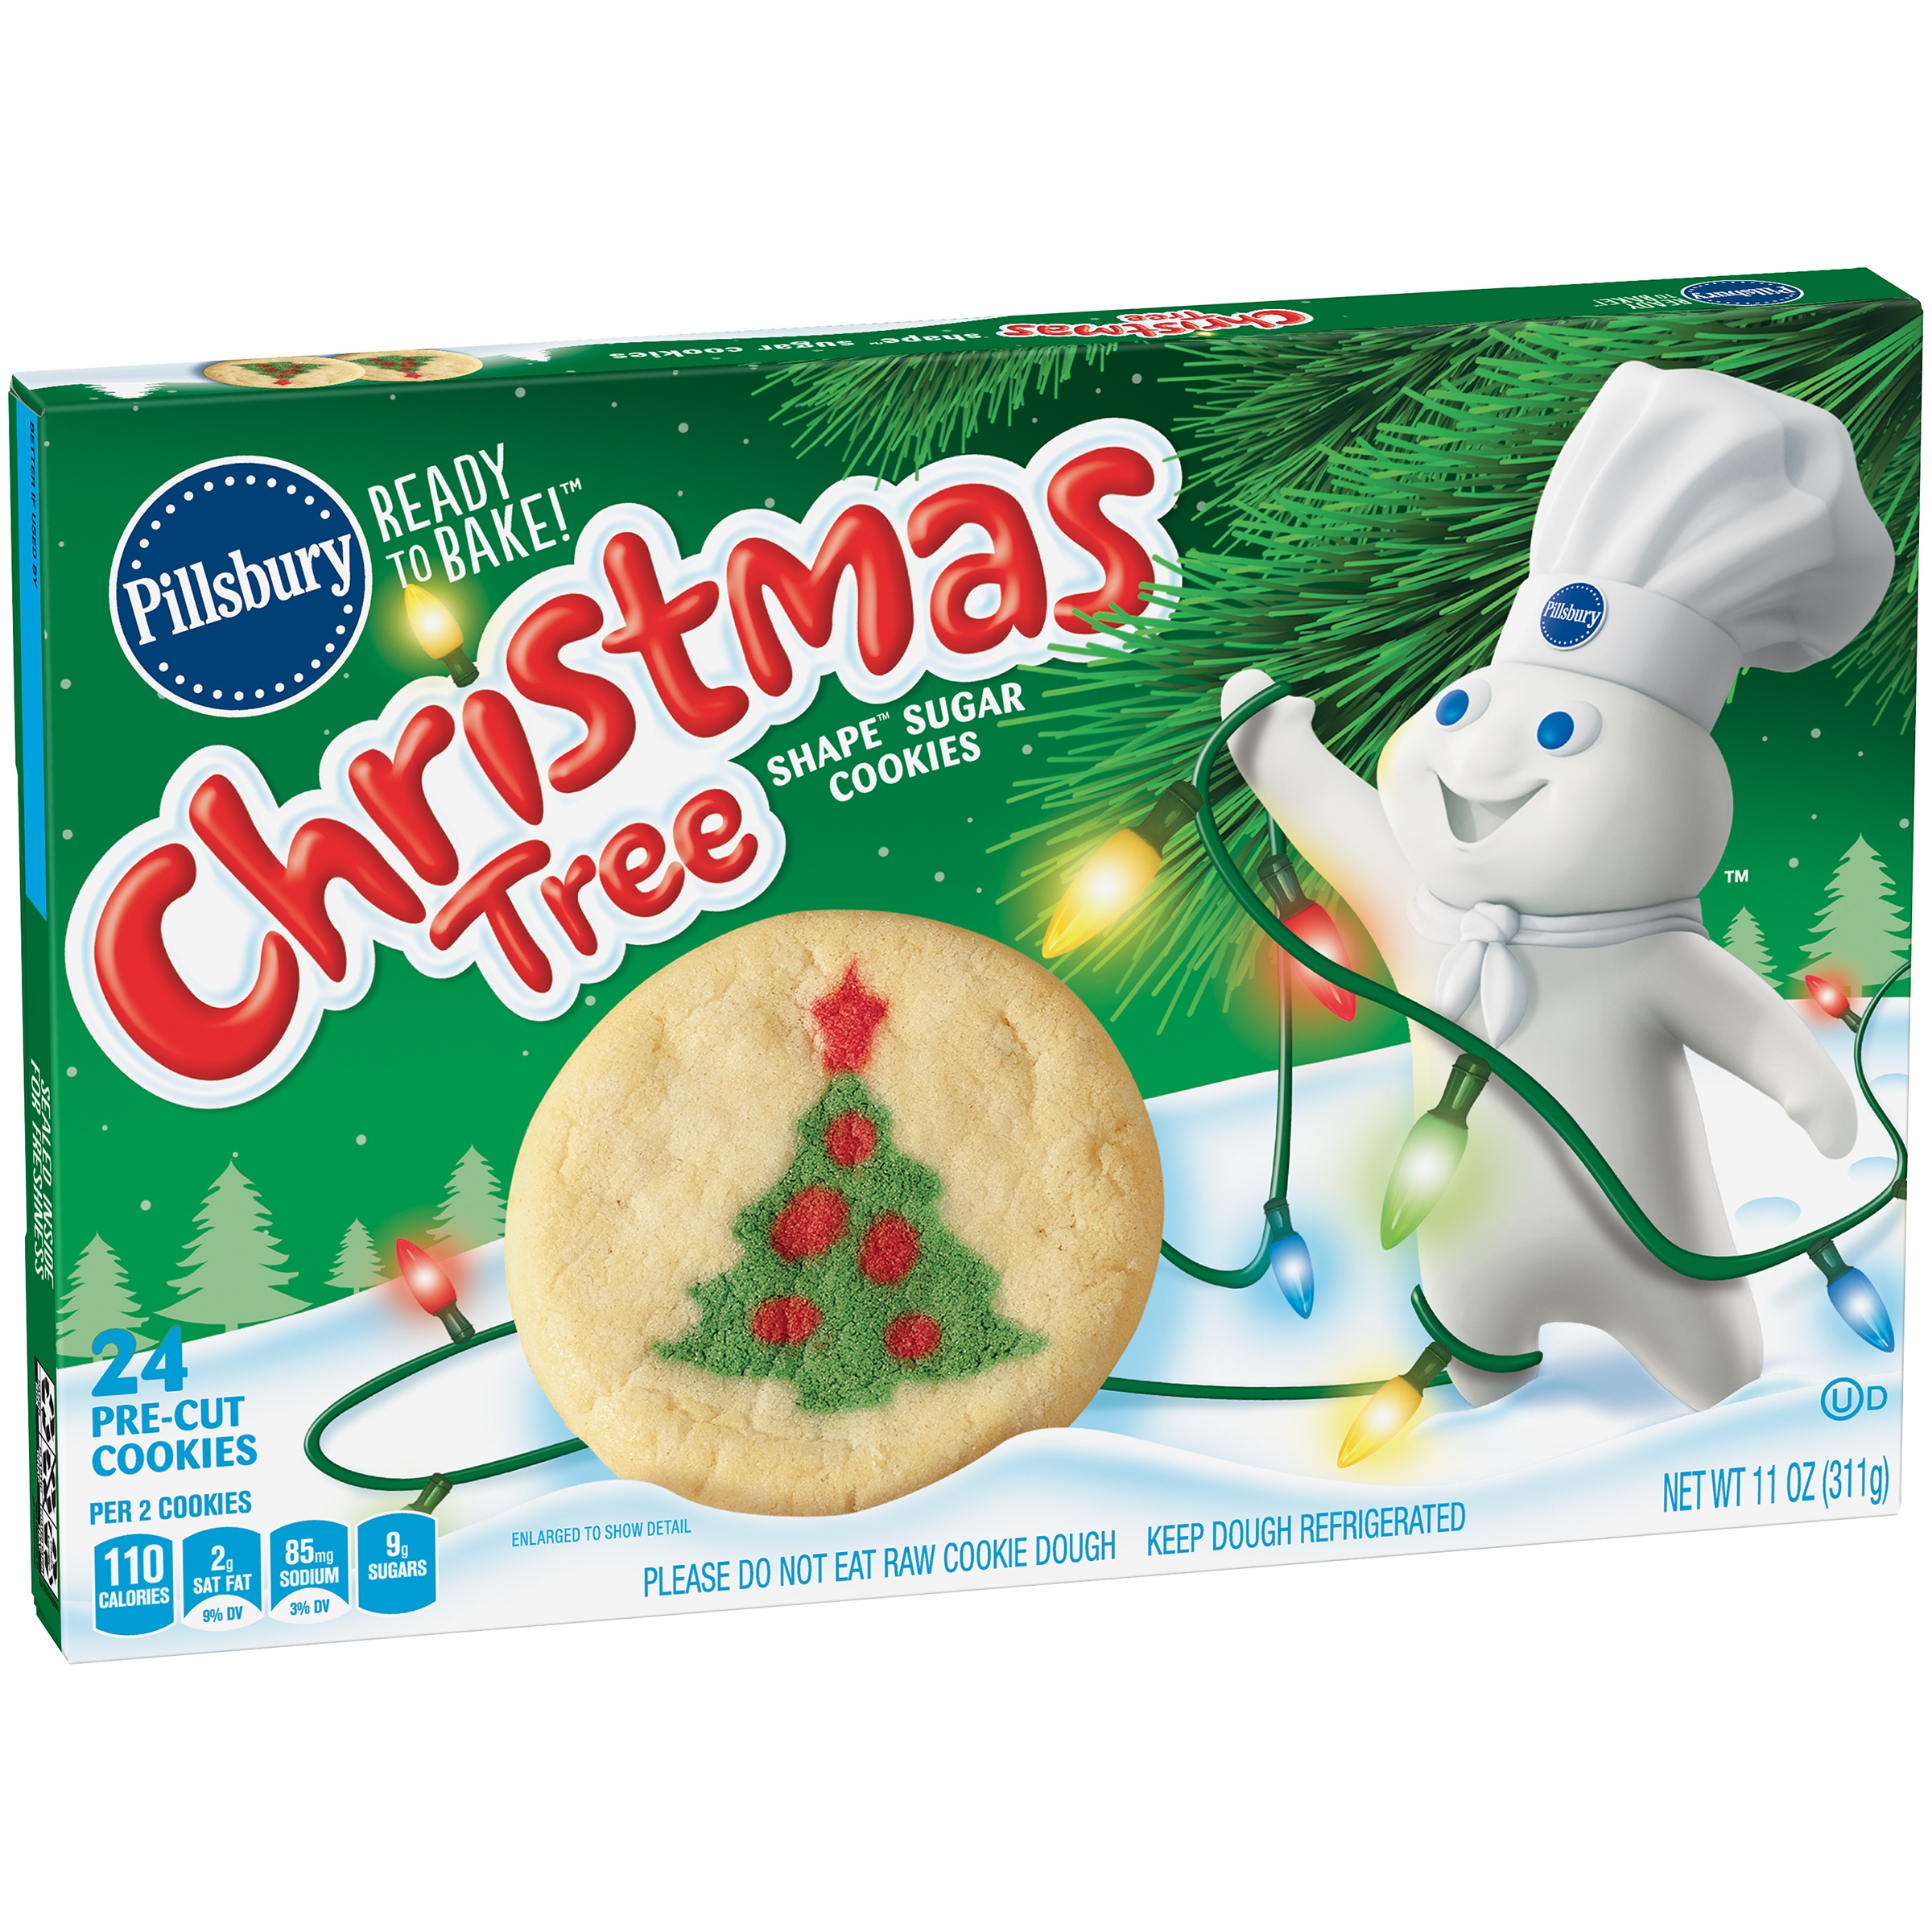 Pillsbury Ready to Bake!™ Christmas Tree Shape™ Sugar Cookies 24 ...